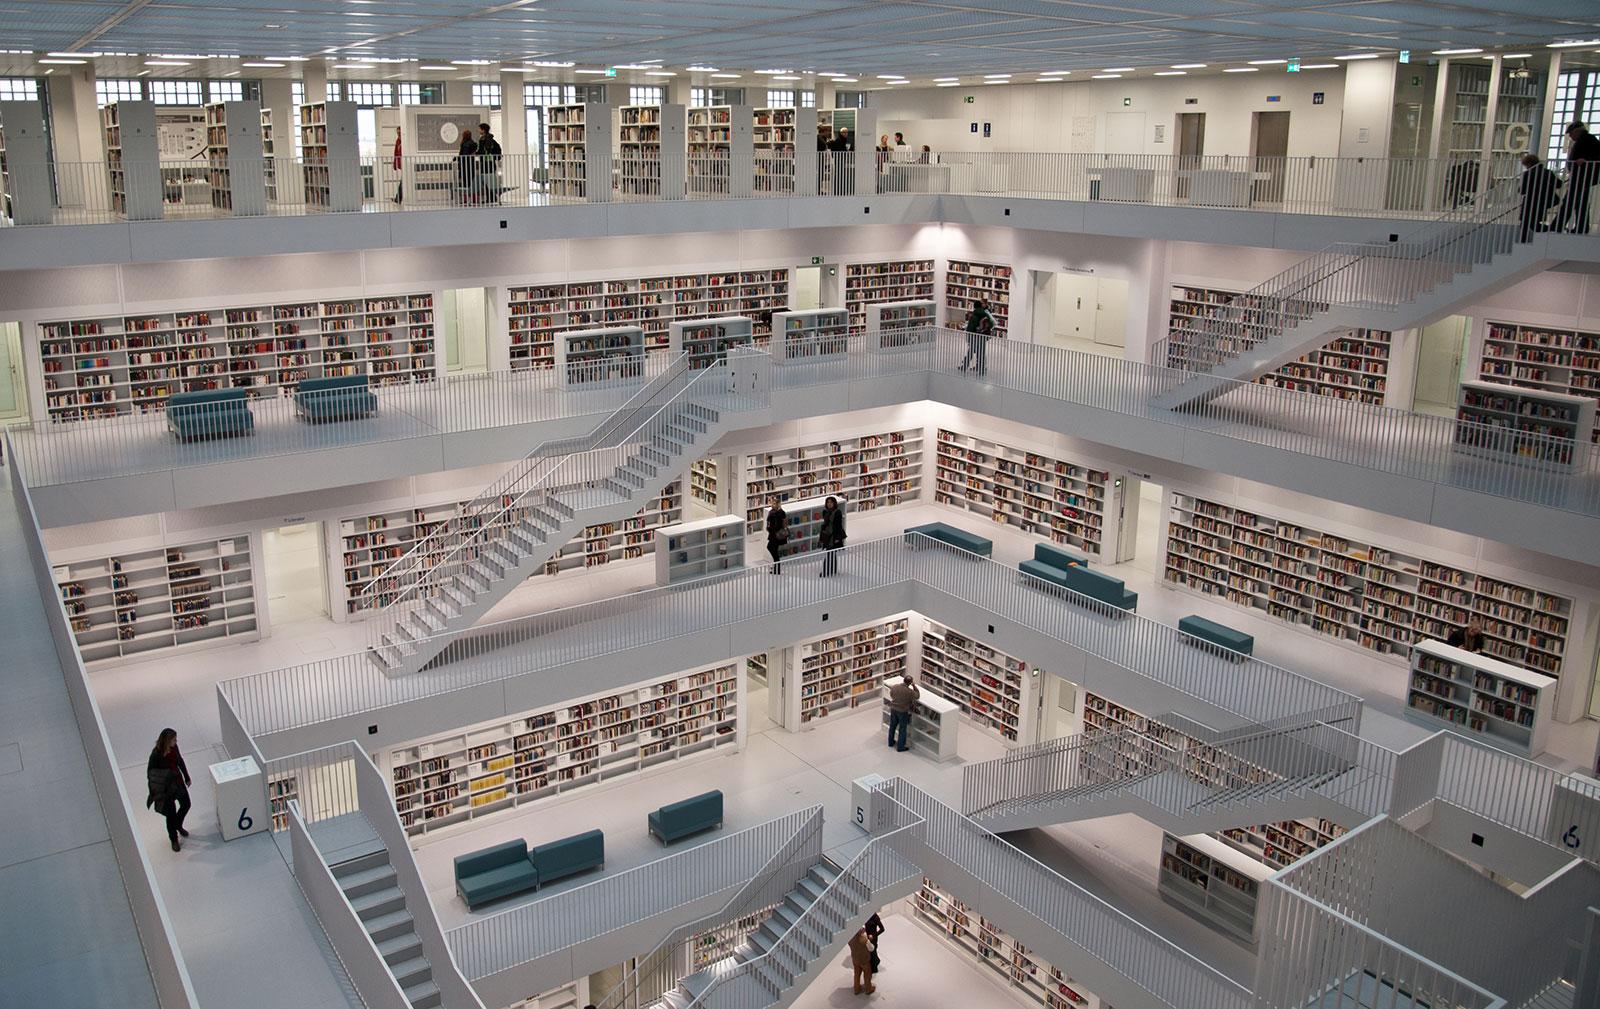 Neue bibliothek stuttgart foto bild architektur for Neue architektur stuttgart